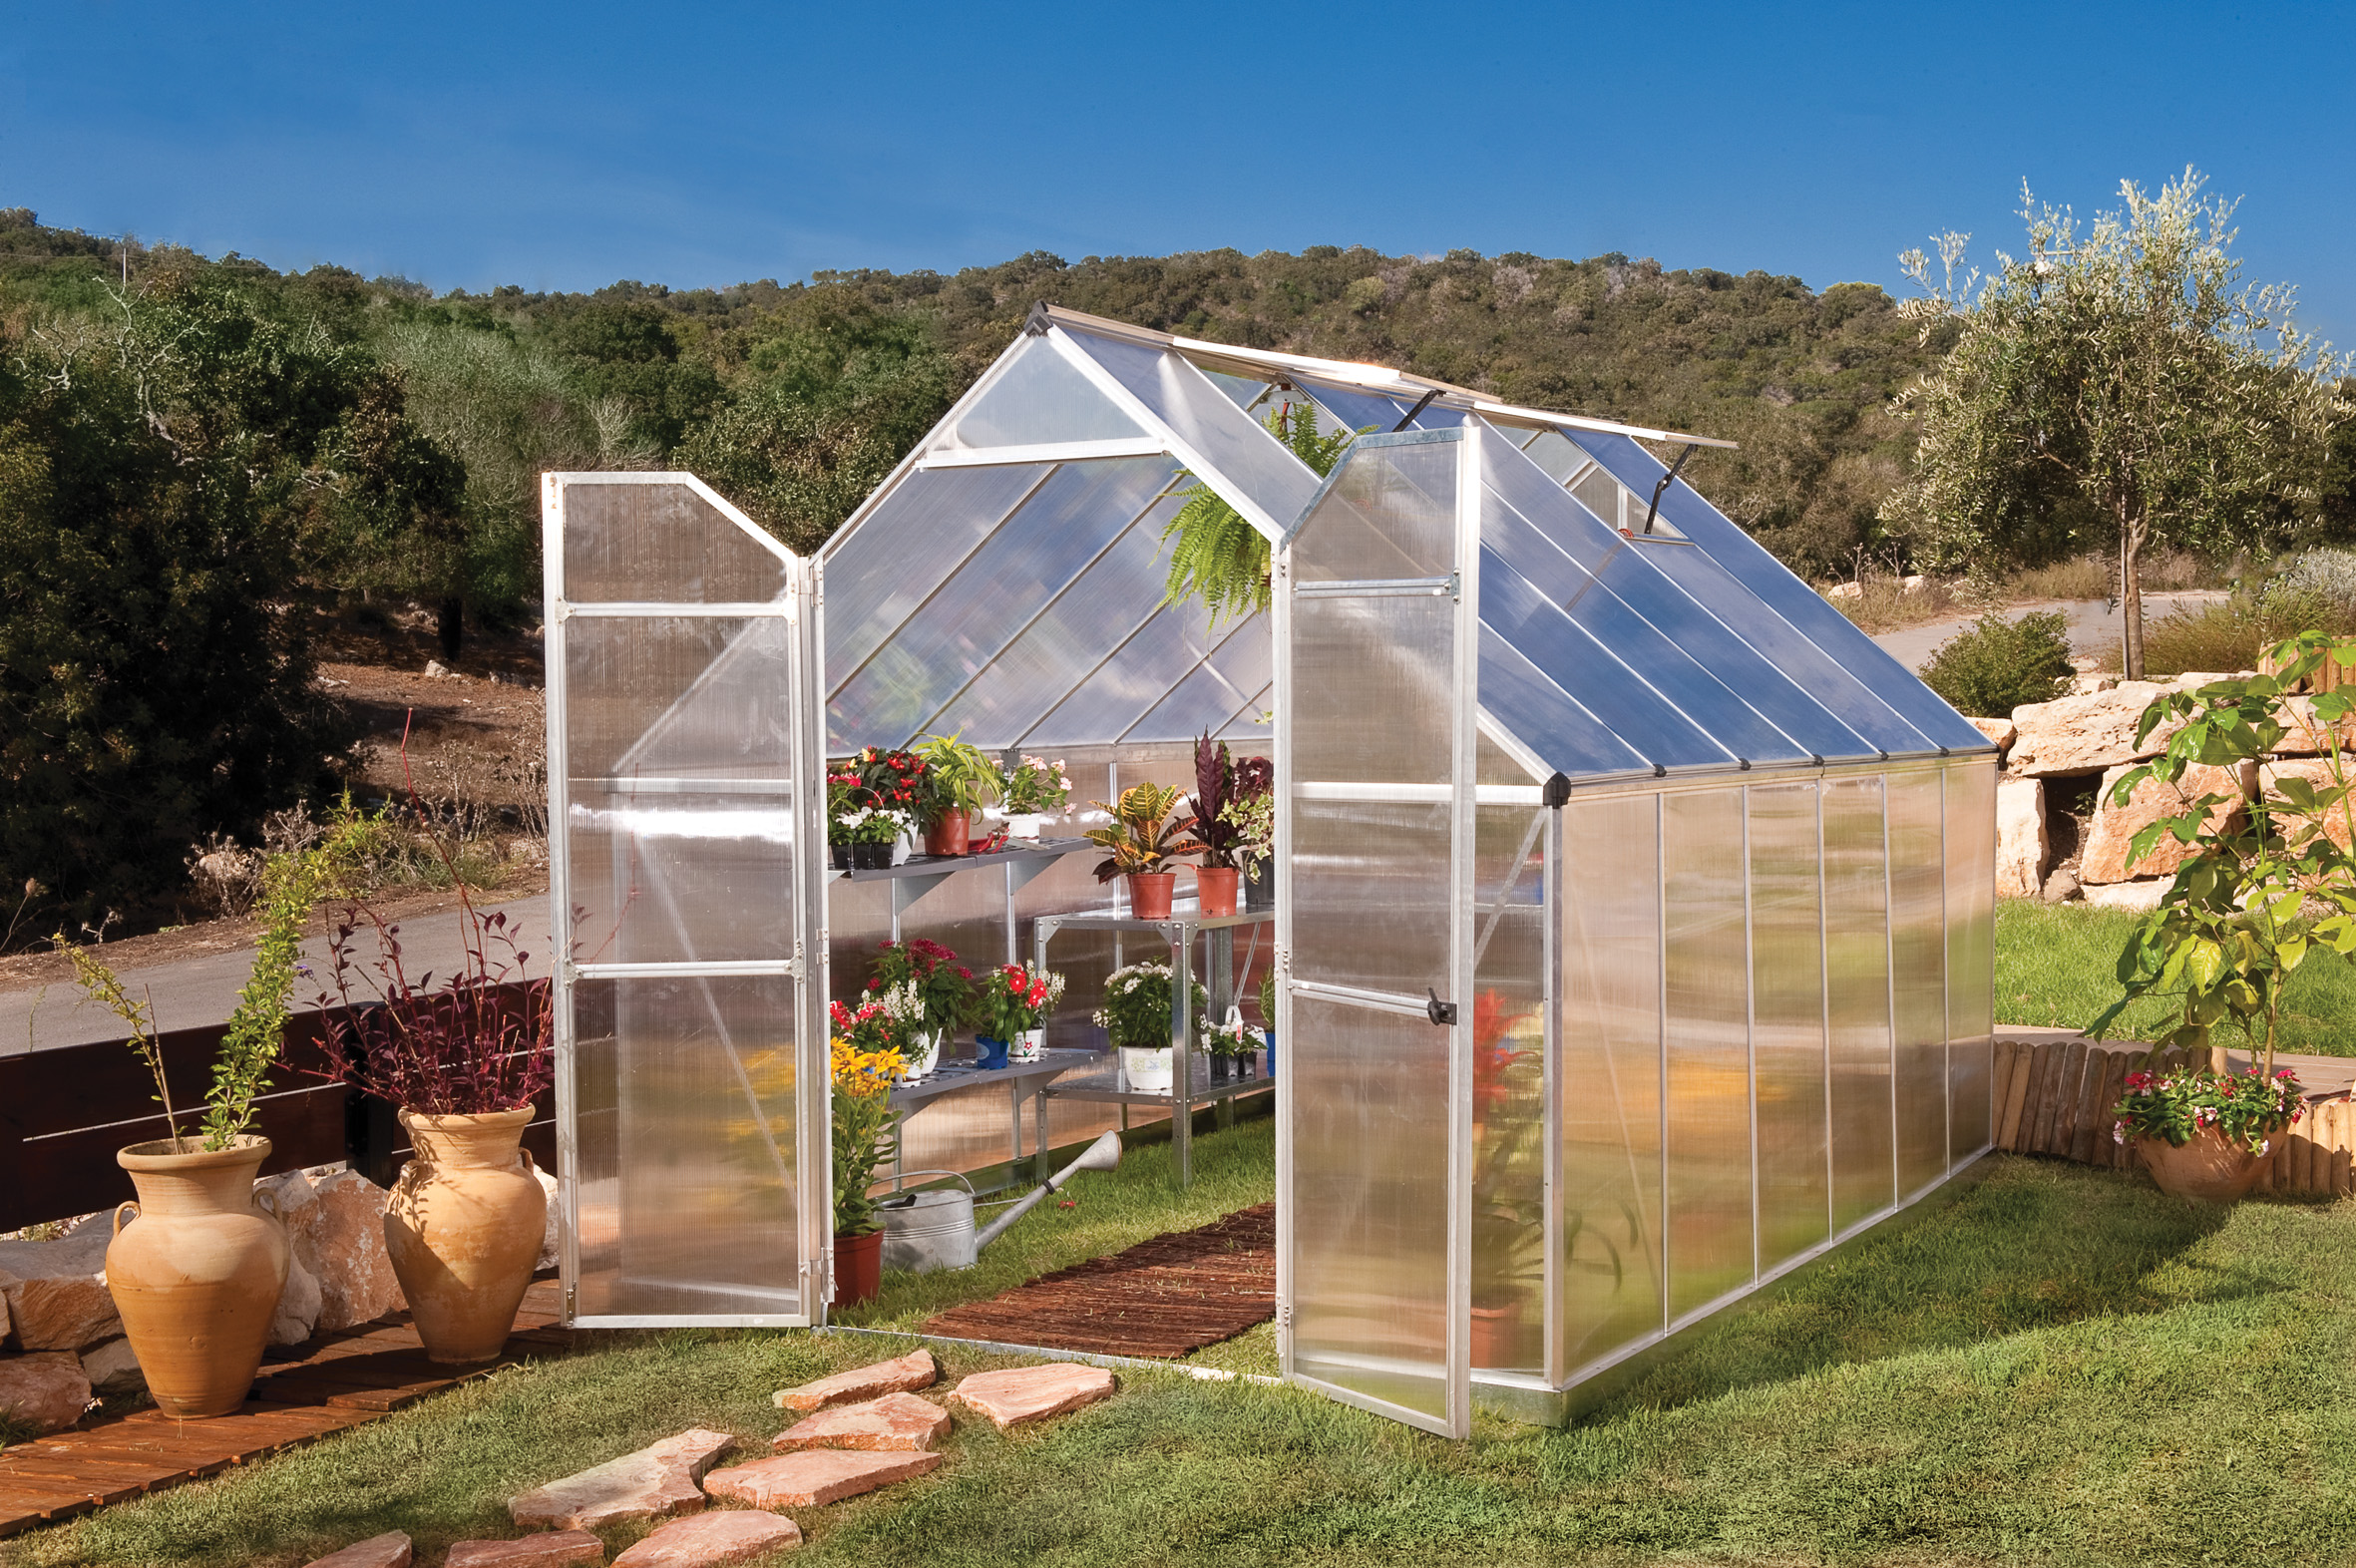 polykarbonátový skleník Palram Essence 8x12 silver + ZDARMA základna skleníku + ZDARMA automatický otvírač oken + ZDARMA sada 10ti háčků pro rostliny + hnojivo Biocin-FF + prodloužená ZÁRUKA 10 LET